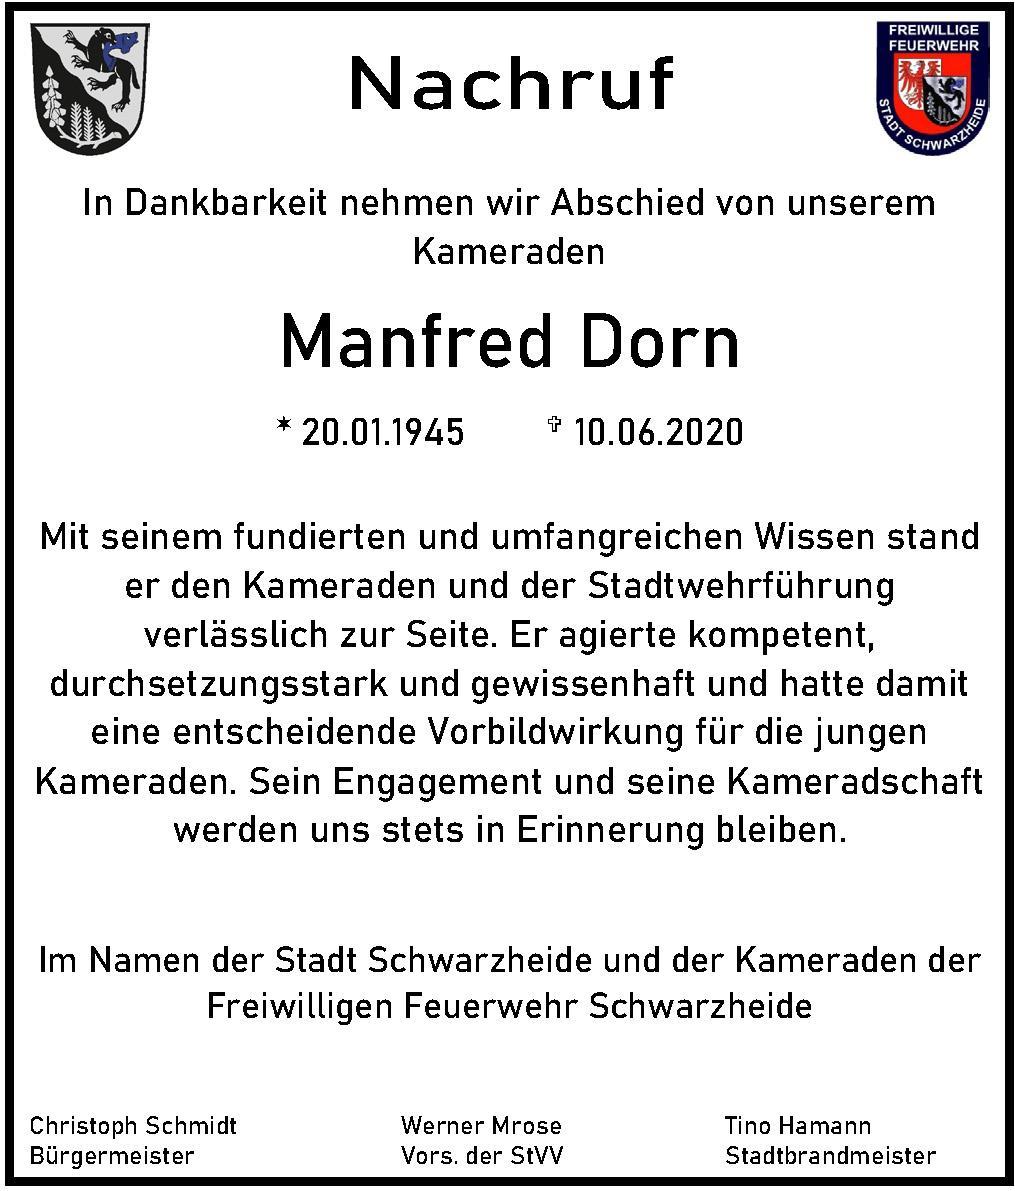 Nachruf Manfred Dorn